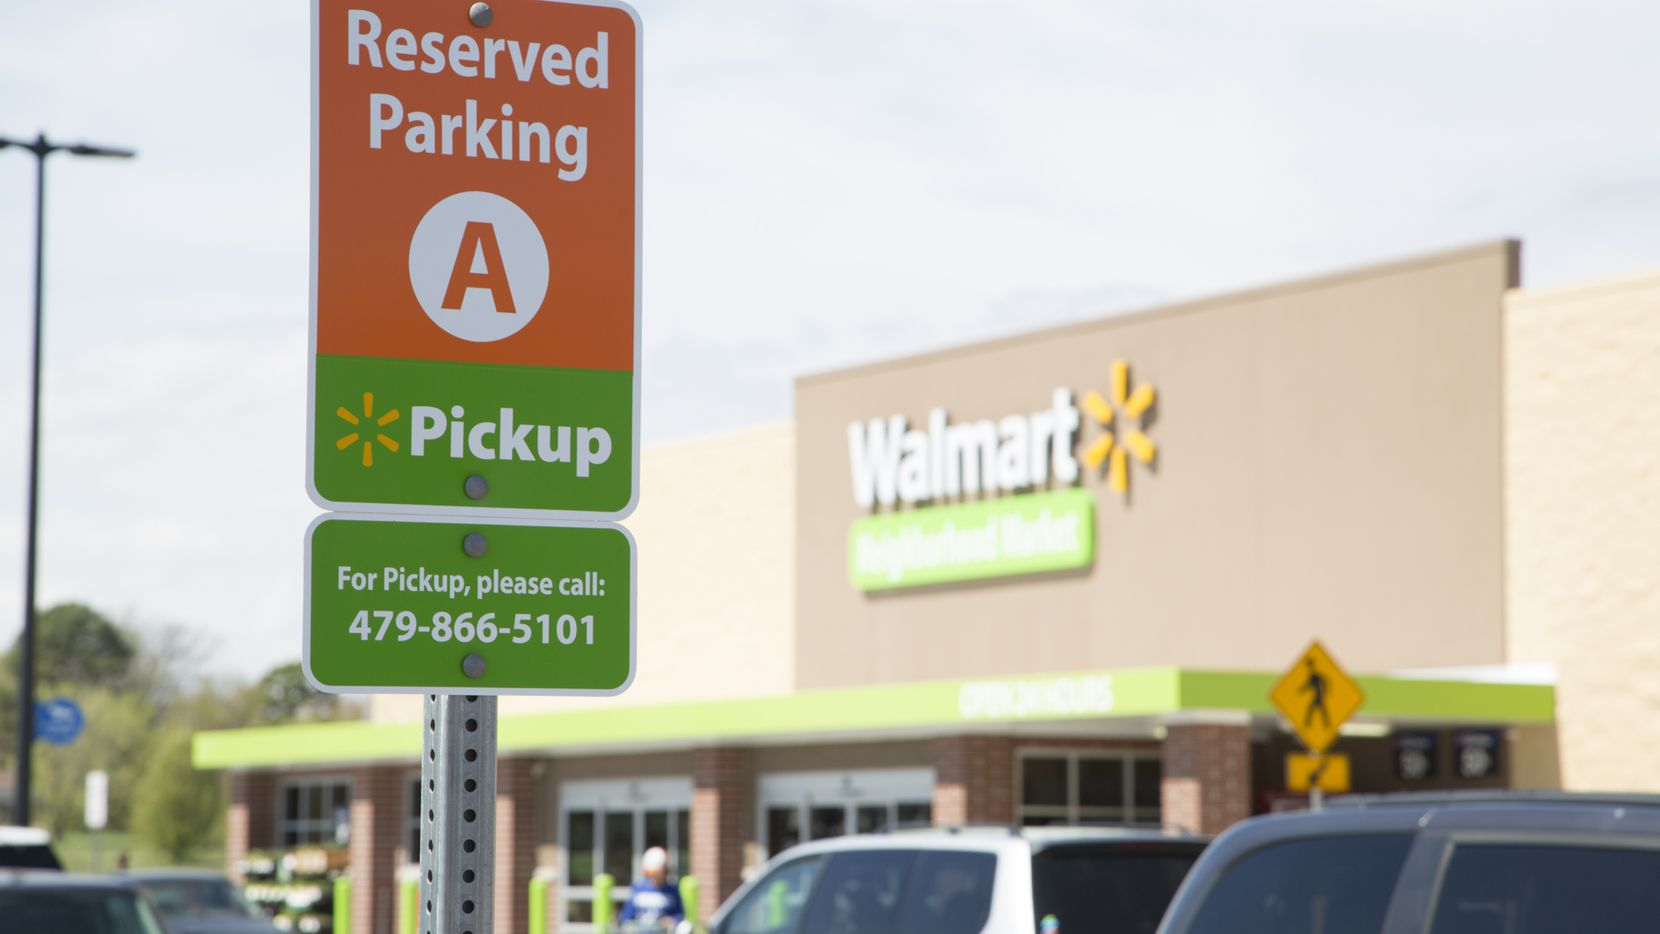 A curbside pickup parking space at a Walmart Neighborhood Market.